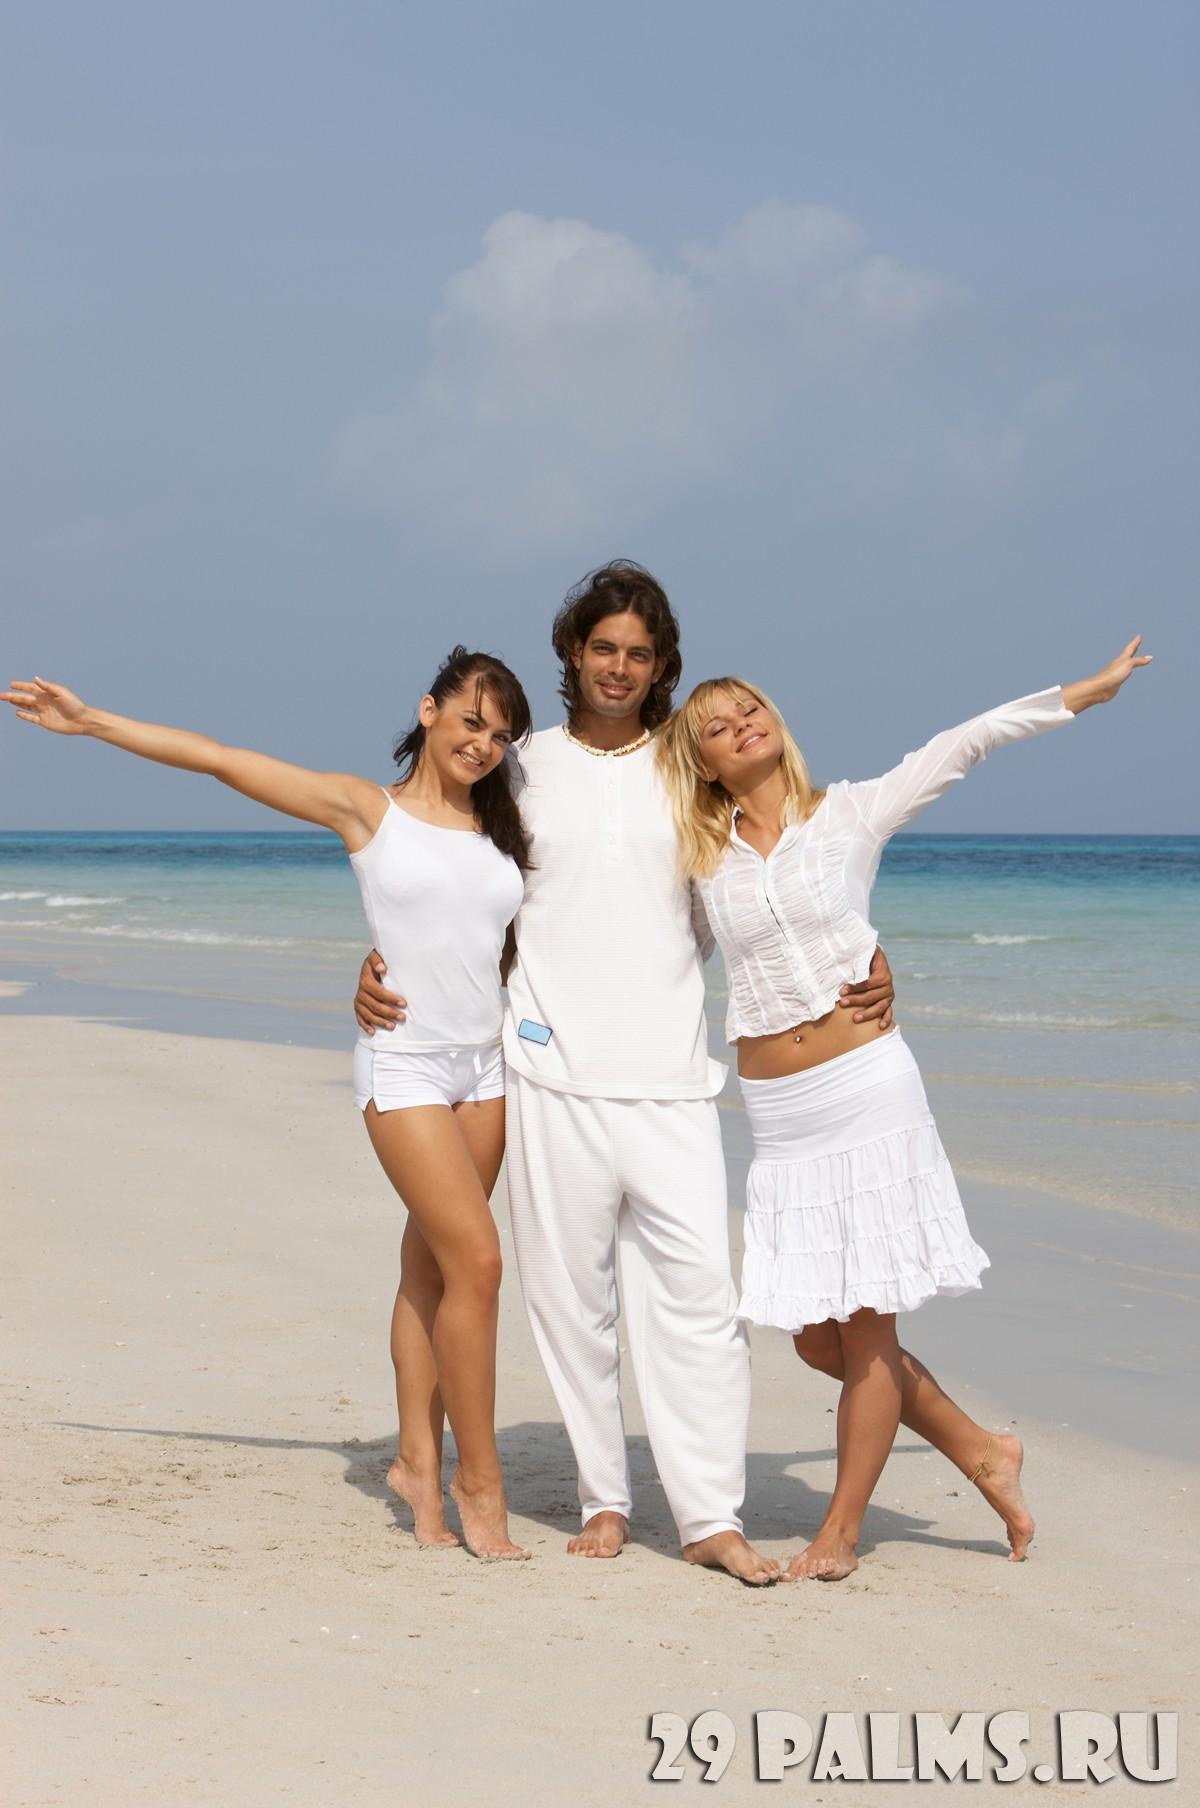 Друзья на пляже фото